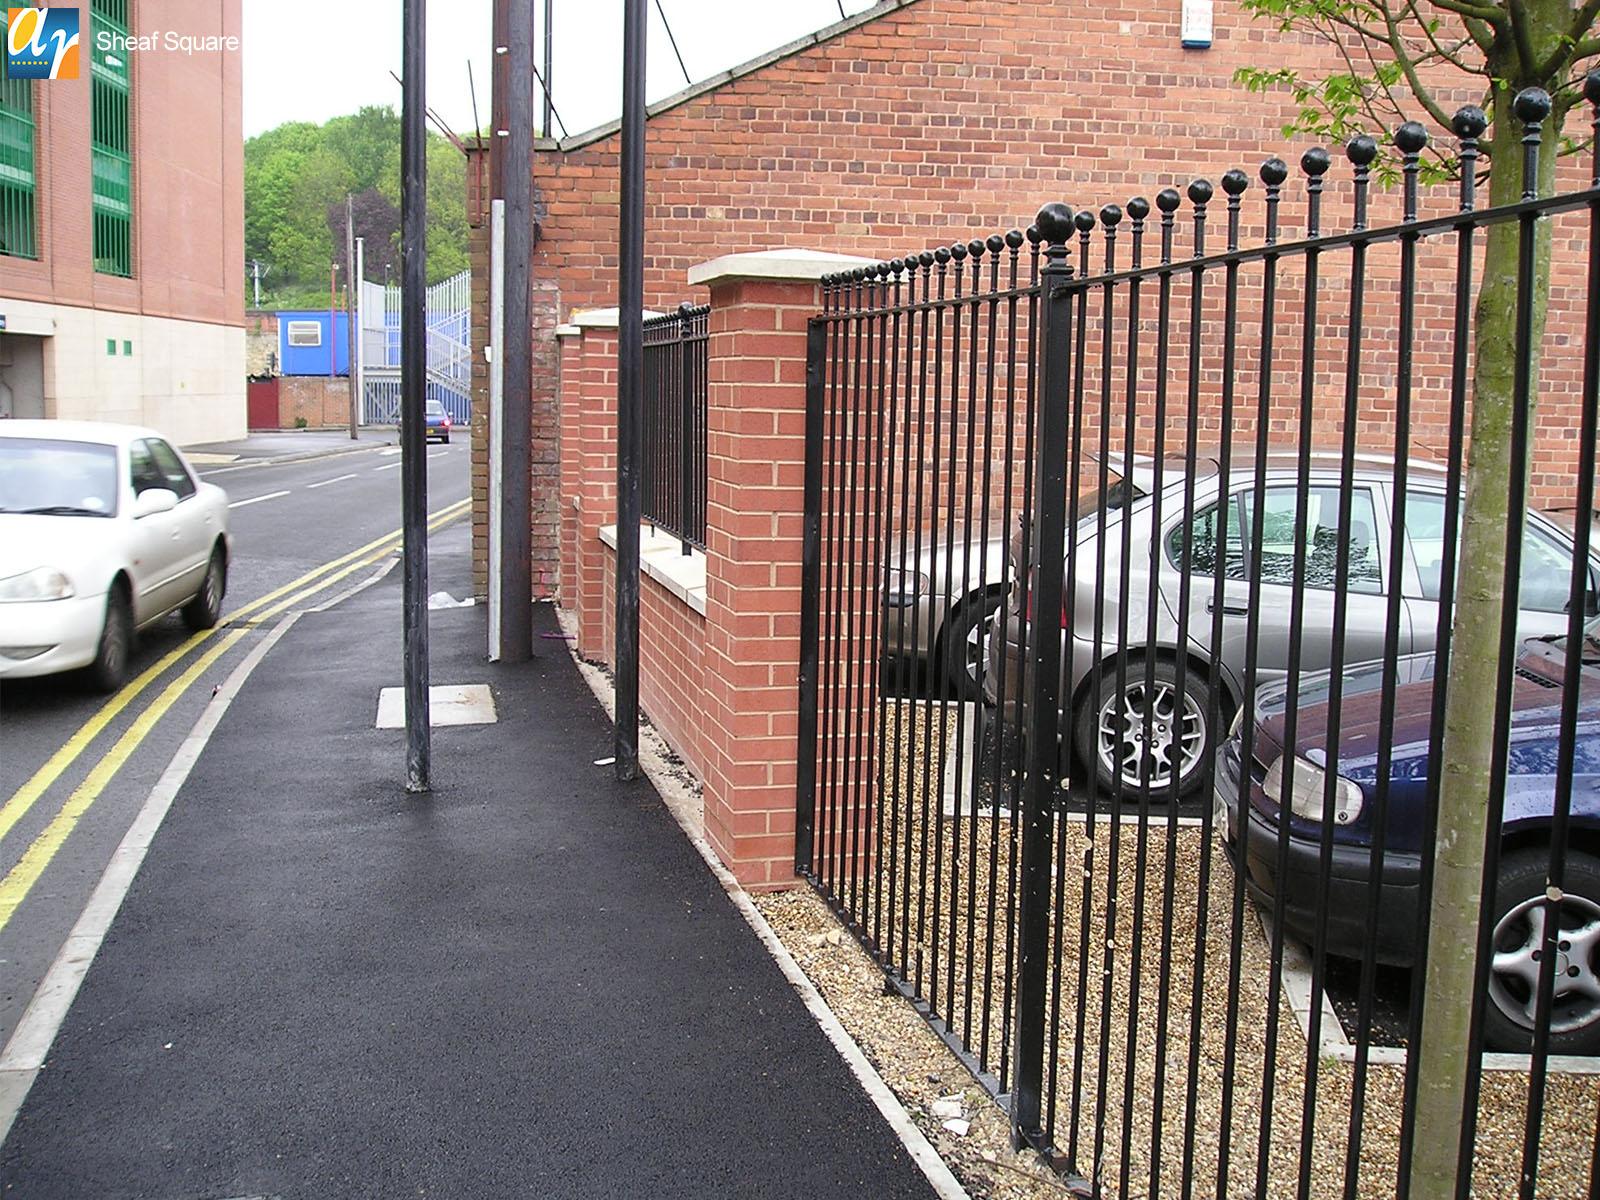 Sheaf Square humber vertical bar railings